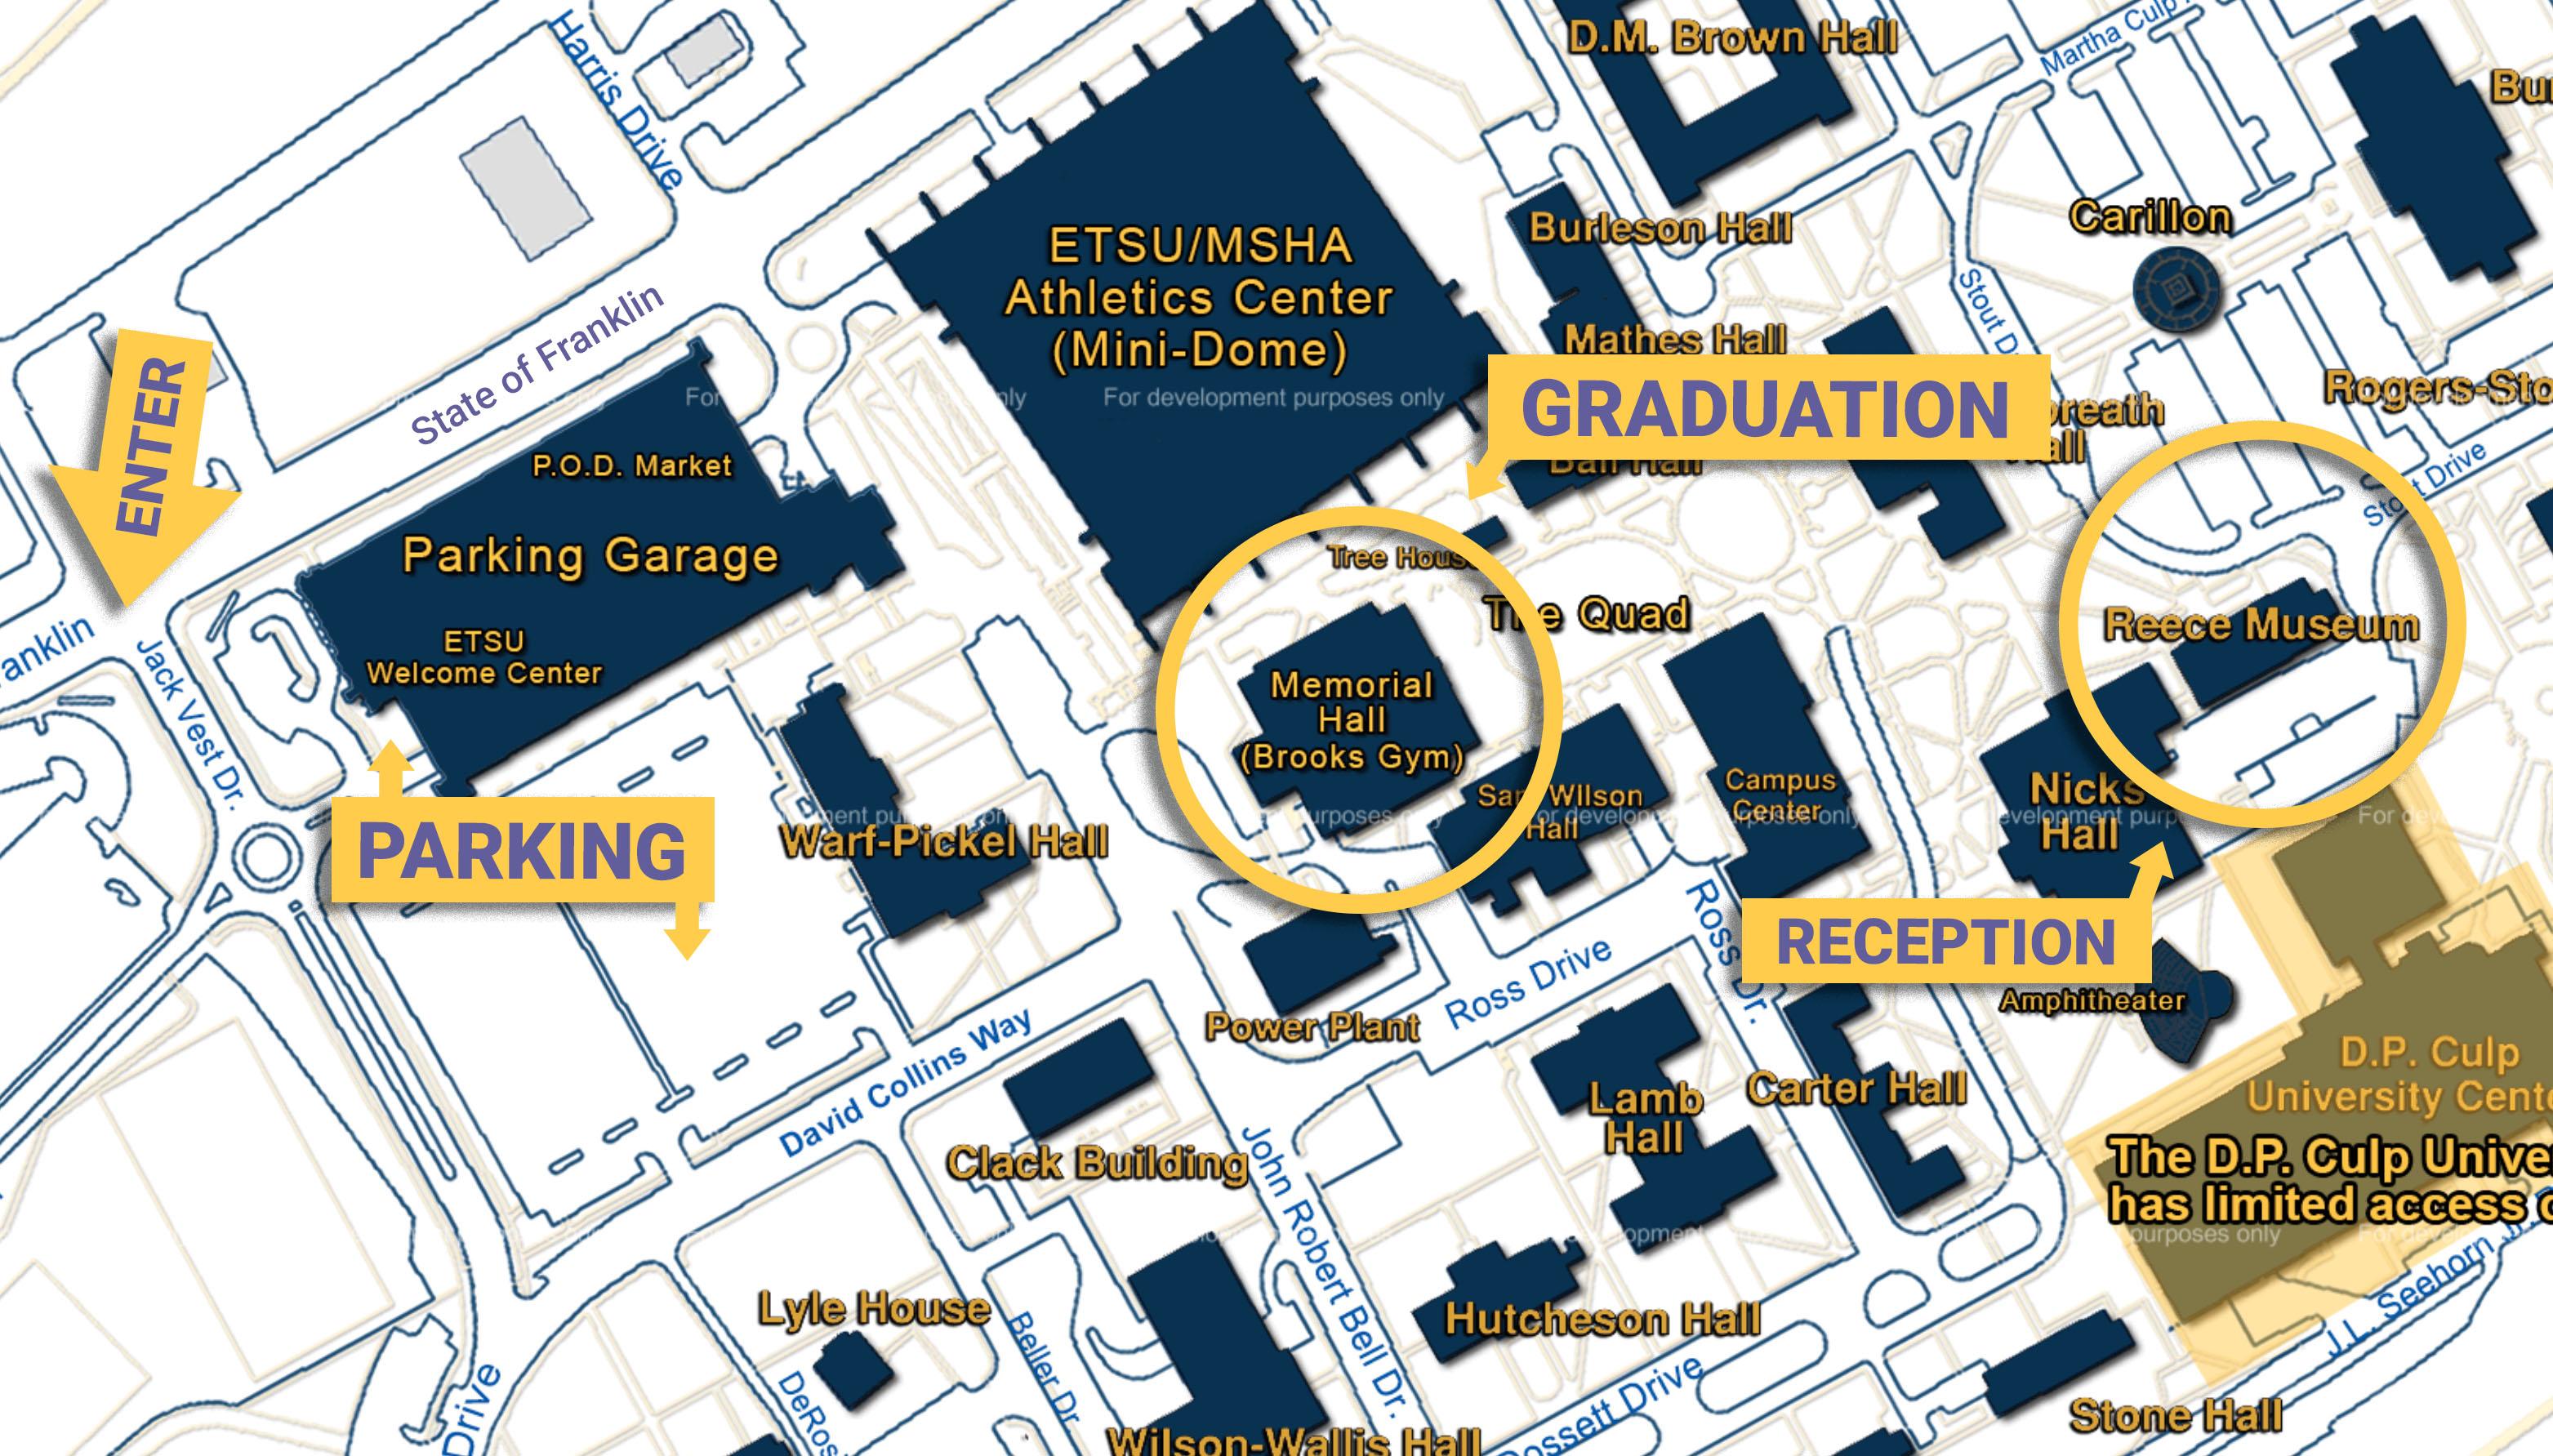 Etsu Campus Map Graduation